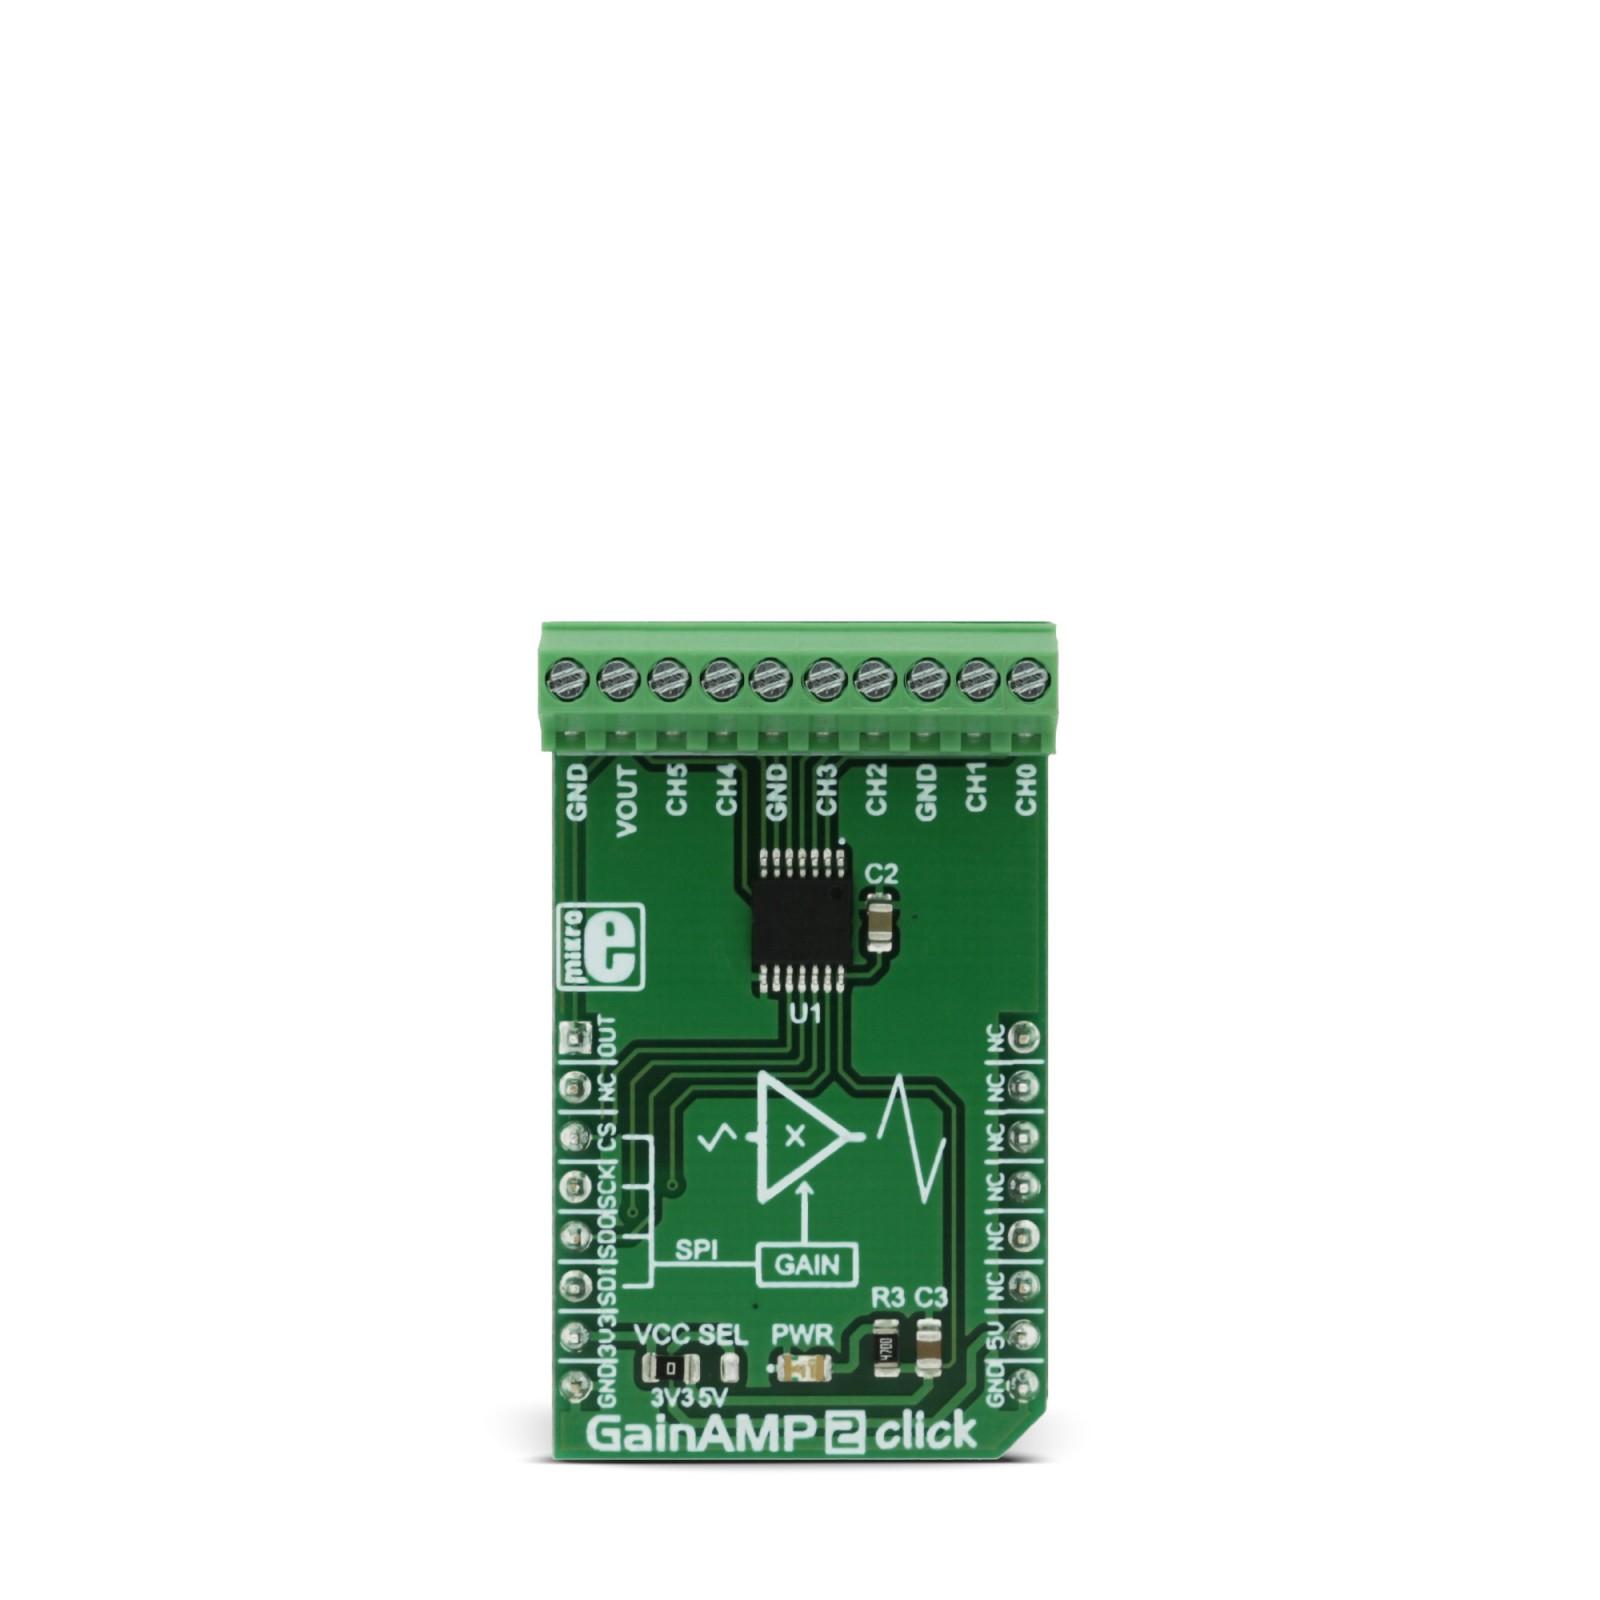 Gainamp 2 Click Mikroelektronika Amplifier Discrete Semiconductor Circuits Electronics Textbook Mgctlbxnmzp Mgctlbxv5112 Mgctlbxlc Mgctlbxpprestashop